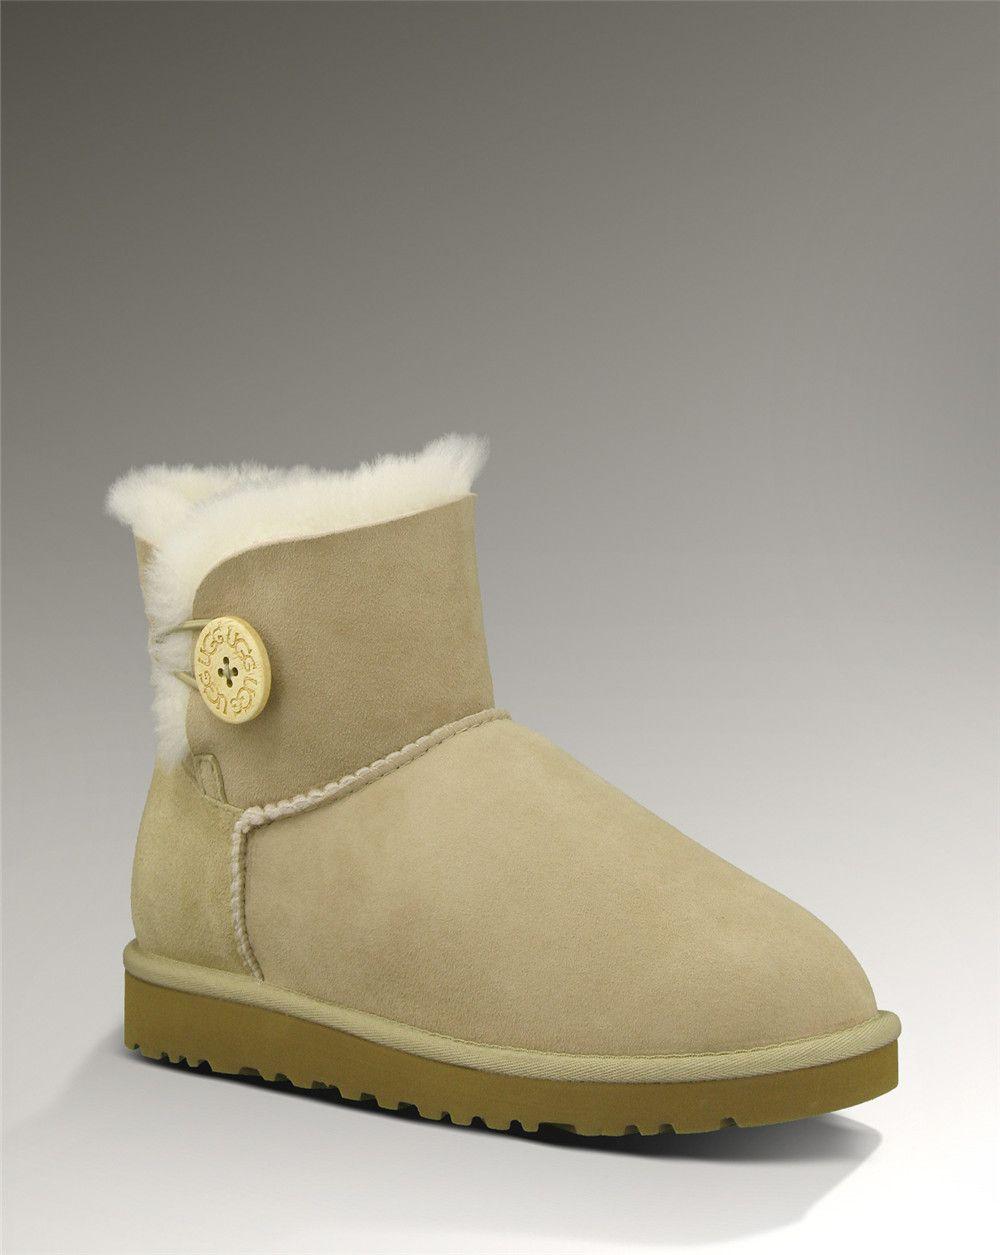 WarmLifeforWinner   Boots, Sand boots, Uggs